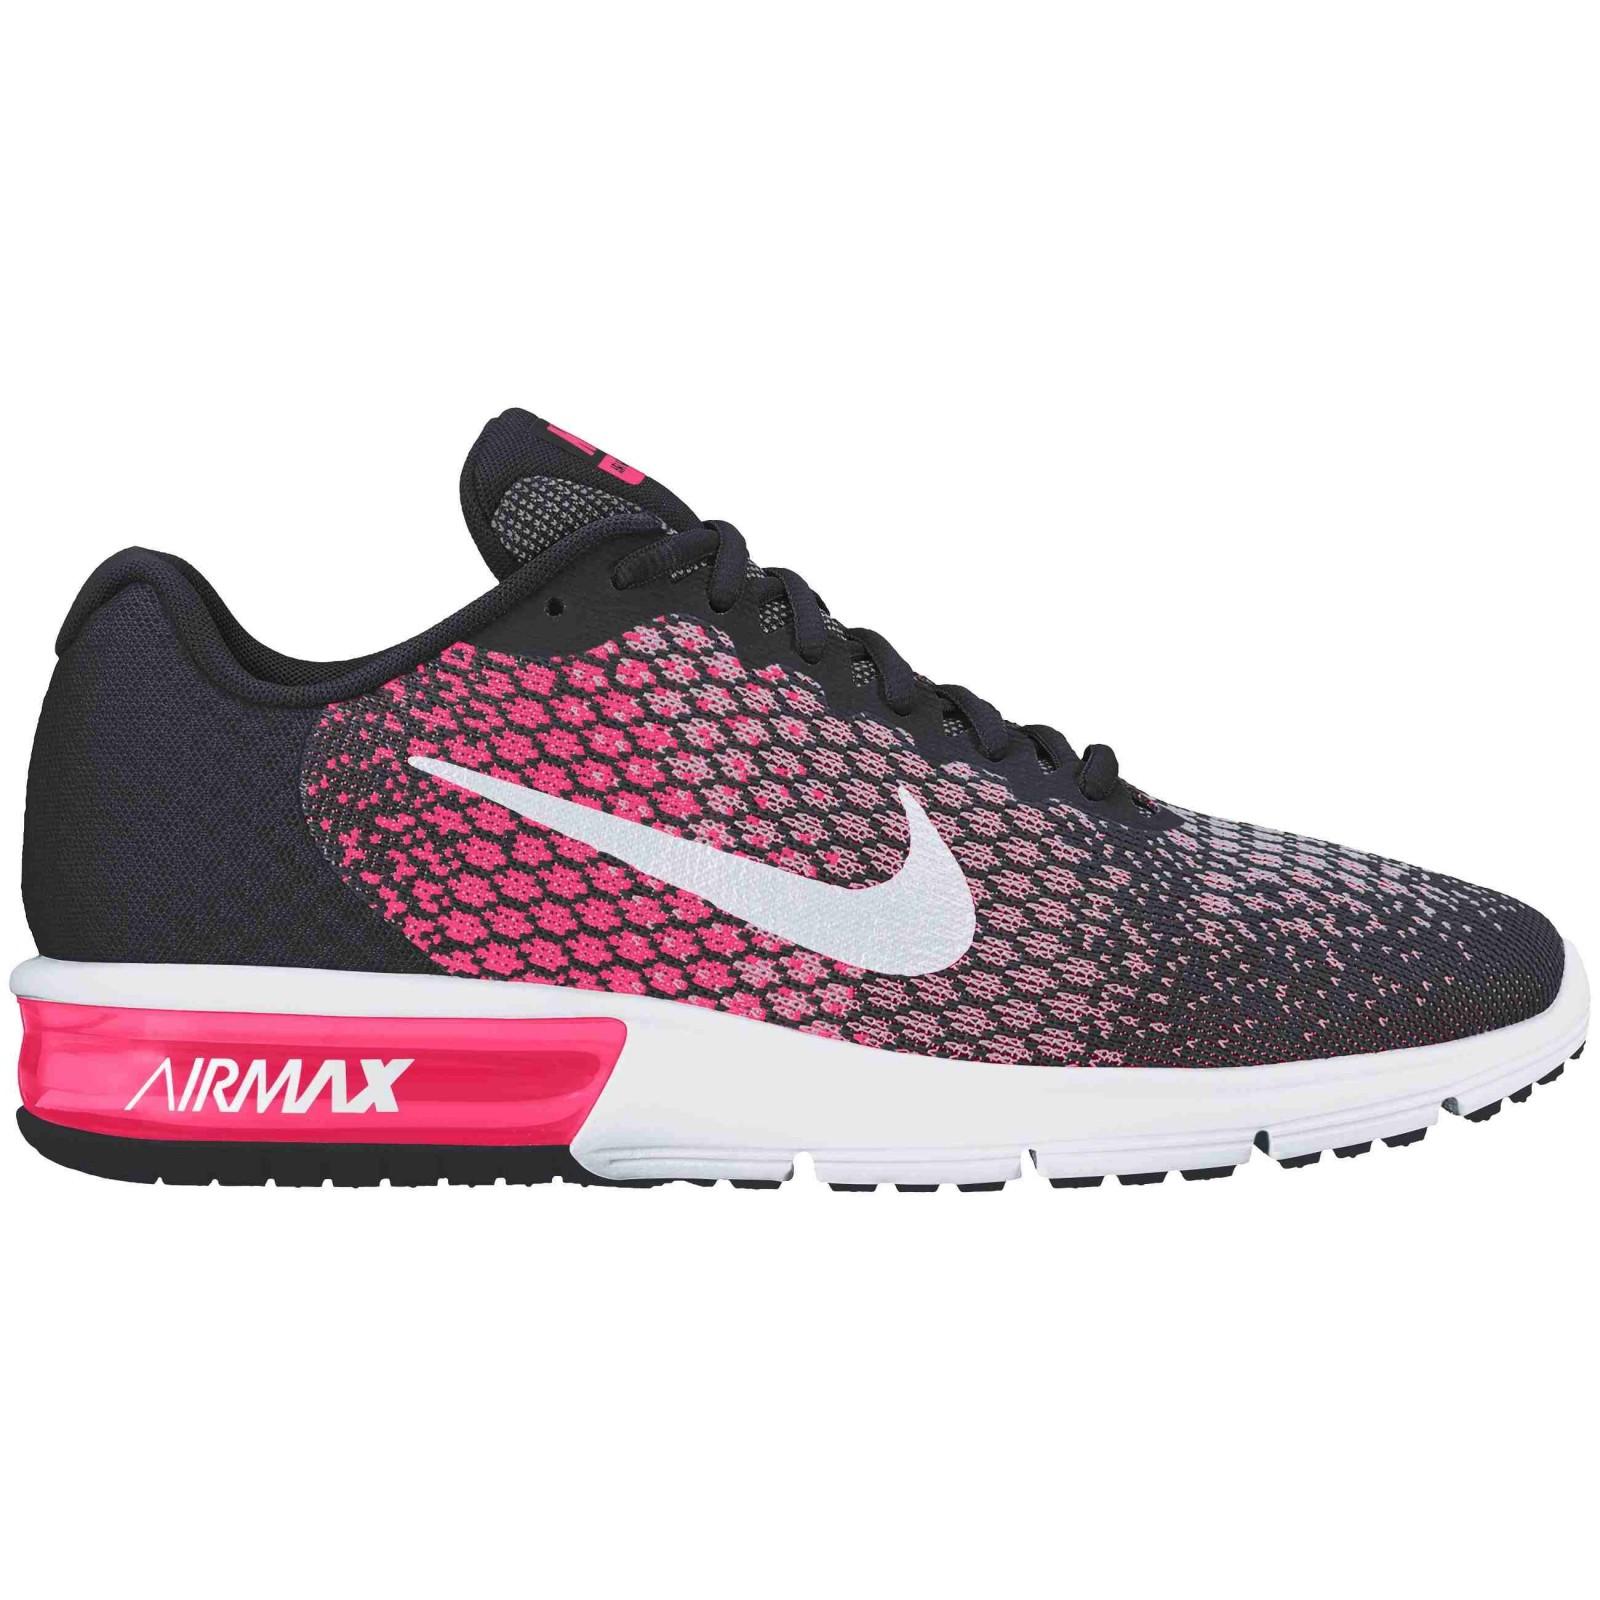 Dámské tenisky Nike WMNS AIR MAX SEQUENT 2  413e8b82f4c